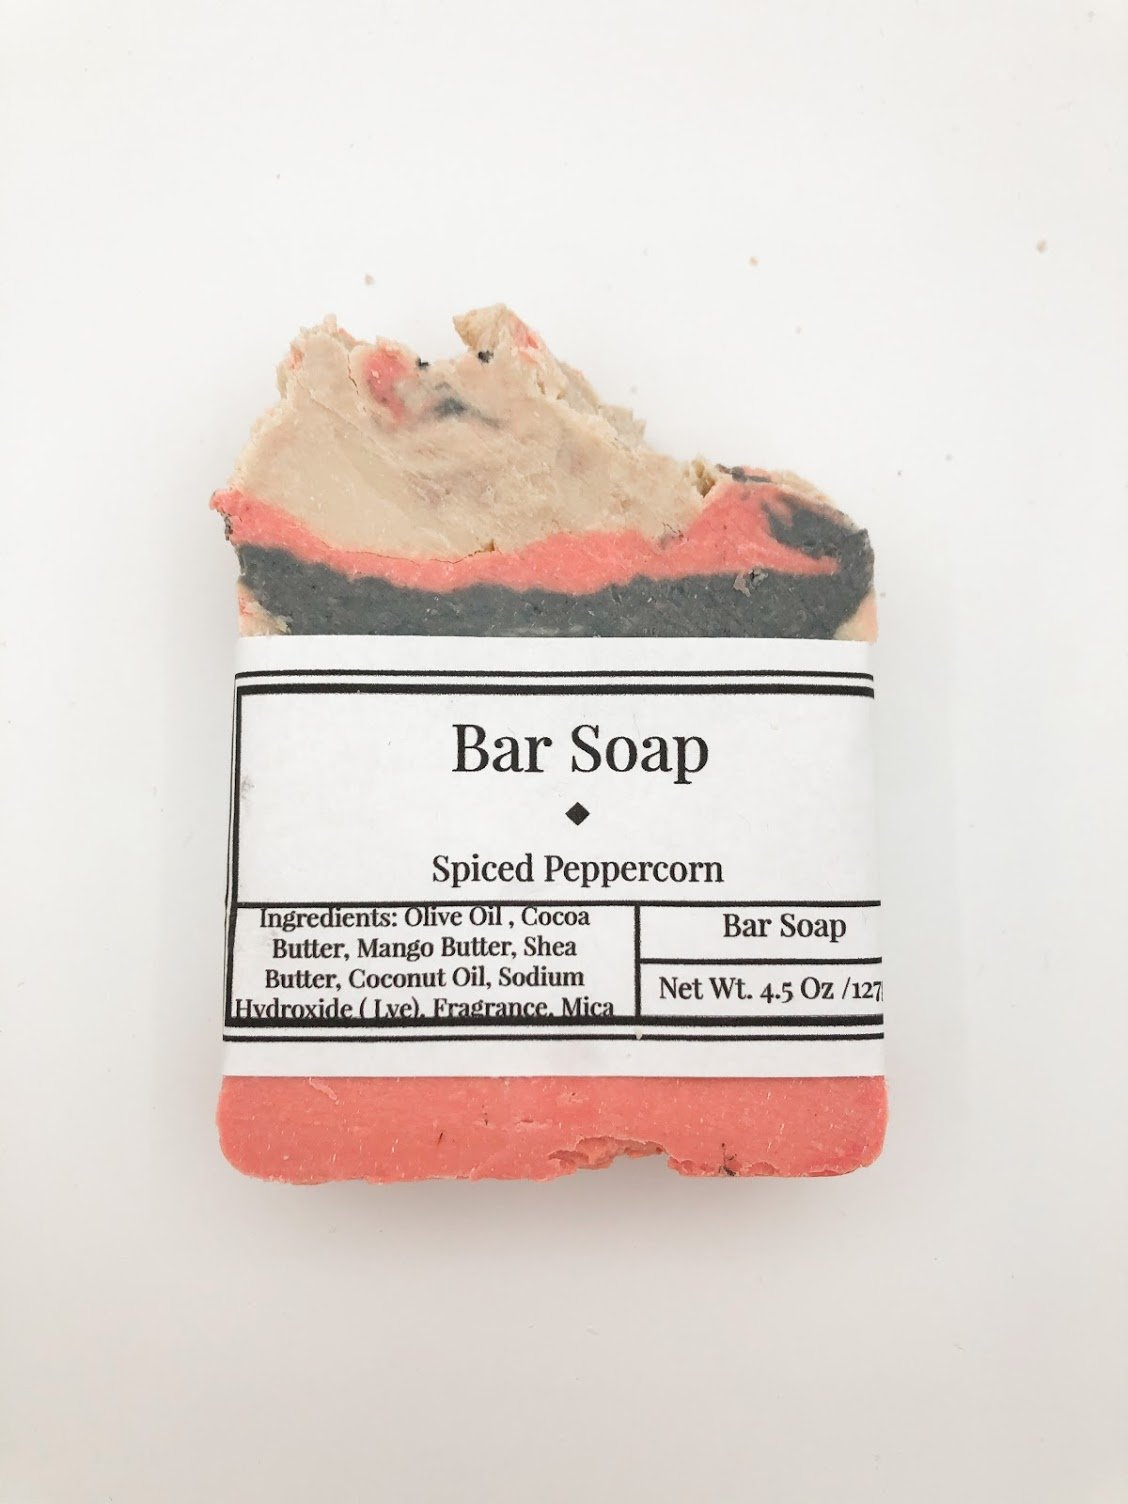 Bar Soap - Spiced Peppercorn